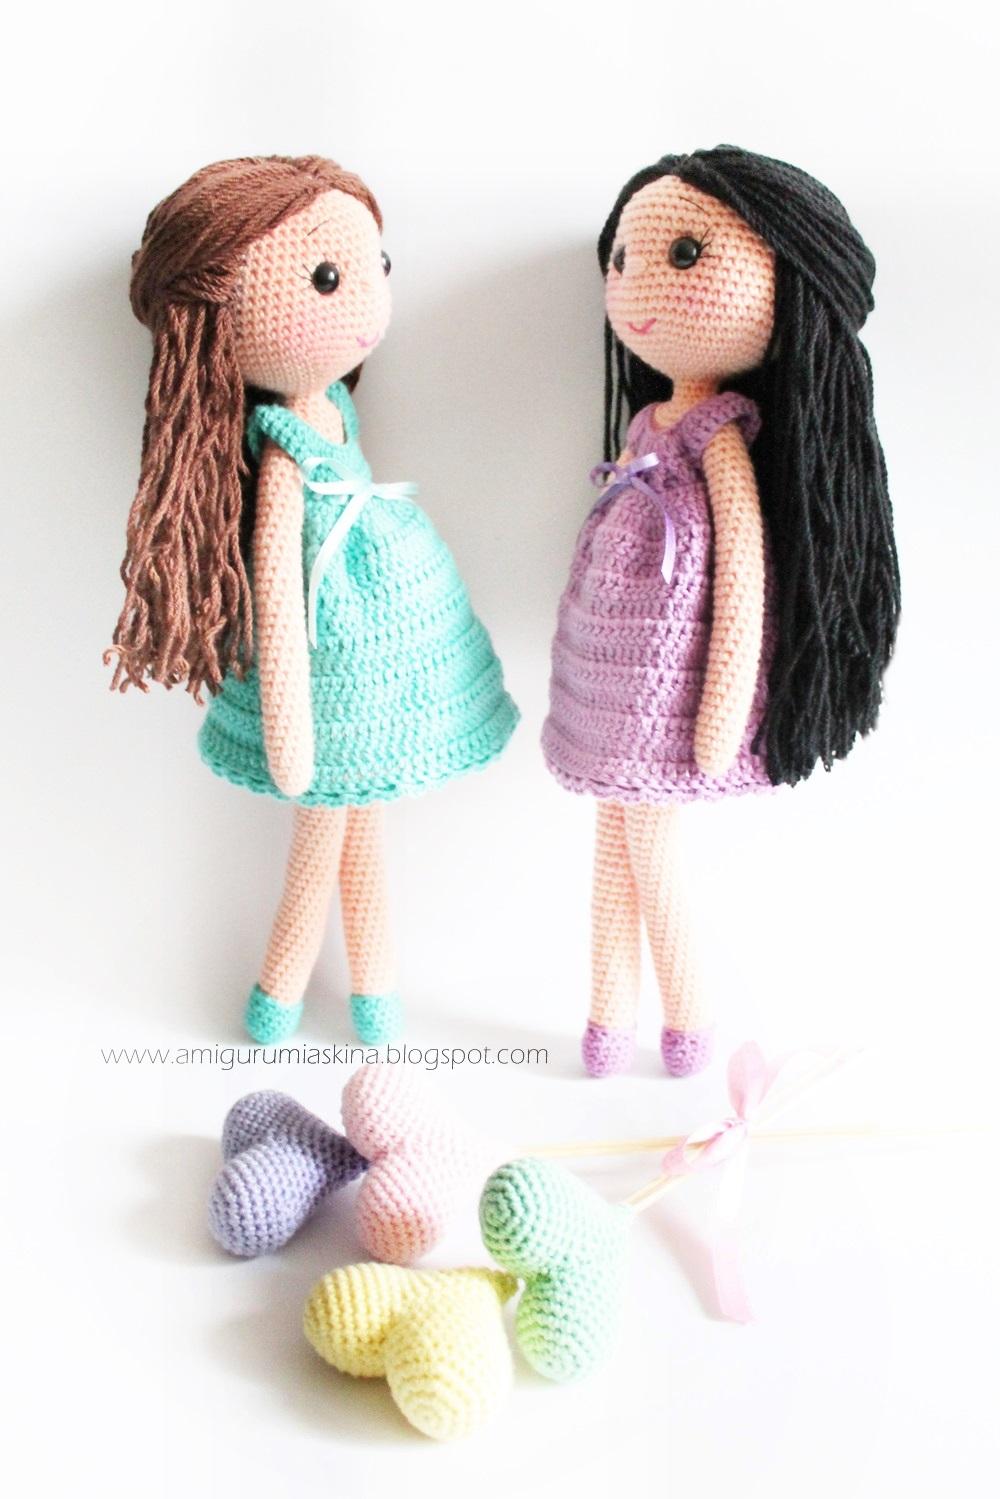 Niloya Amigurumi Free Pattern Doll Oyuncak Bebek : Amigurumi Abla-Karde? Bebekler-AmigurumiDoll - Tiny Mini ...